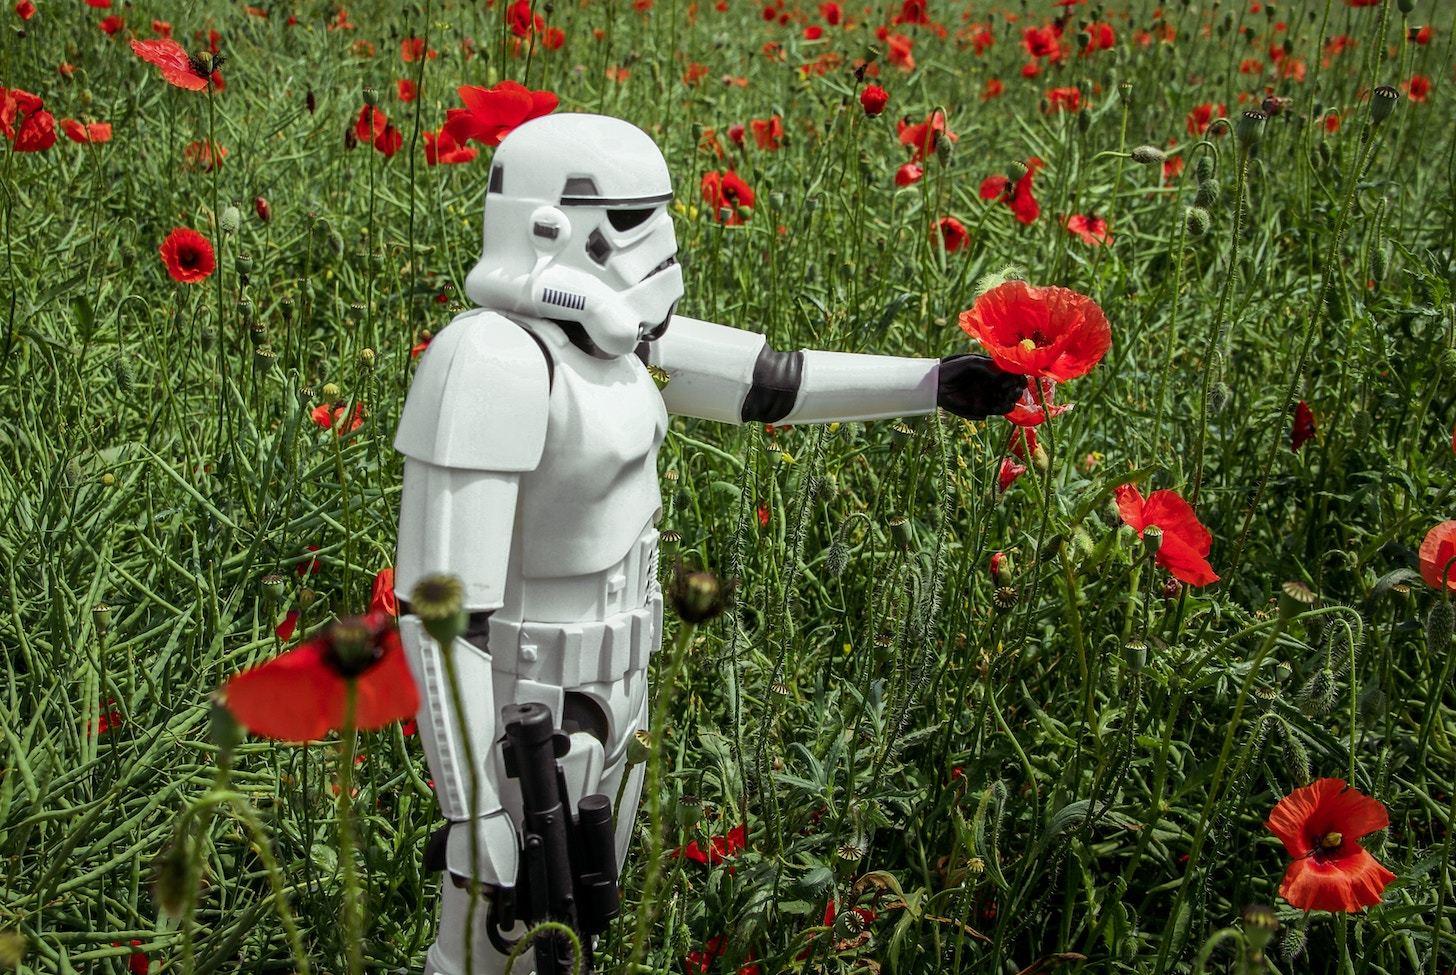 Stormtrooper holding a flower